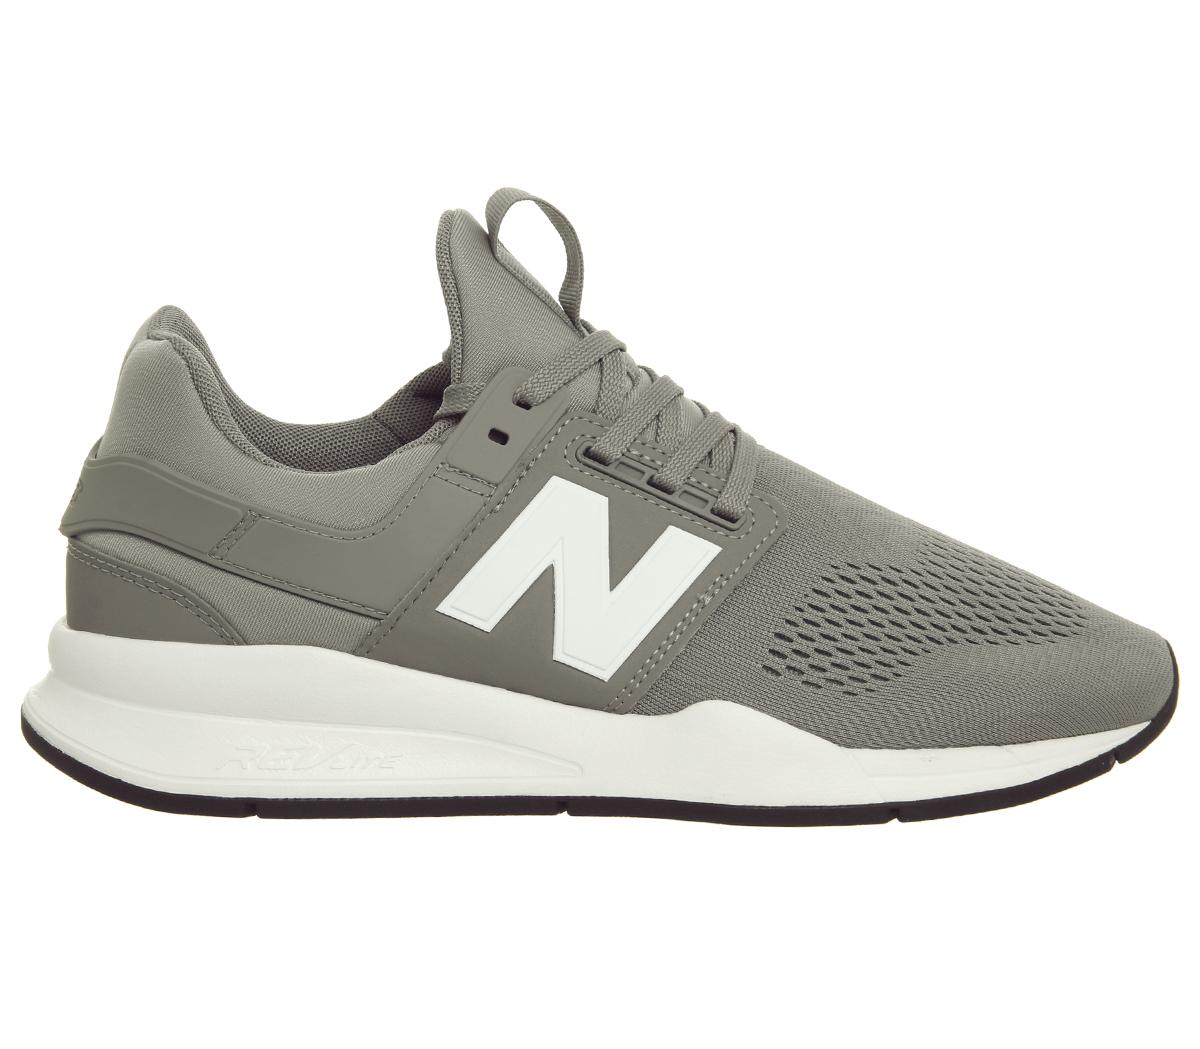 New-Balance-247V2-Baskets-Marblehead-Baskets-Chaussures miniature 3